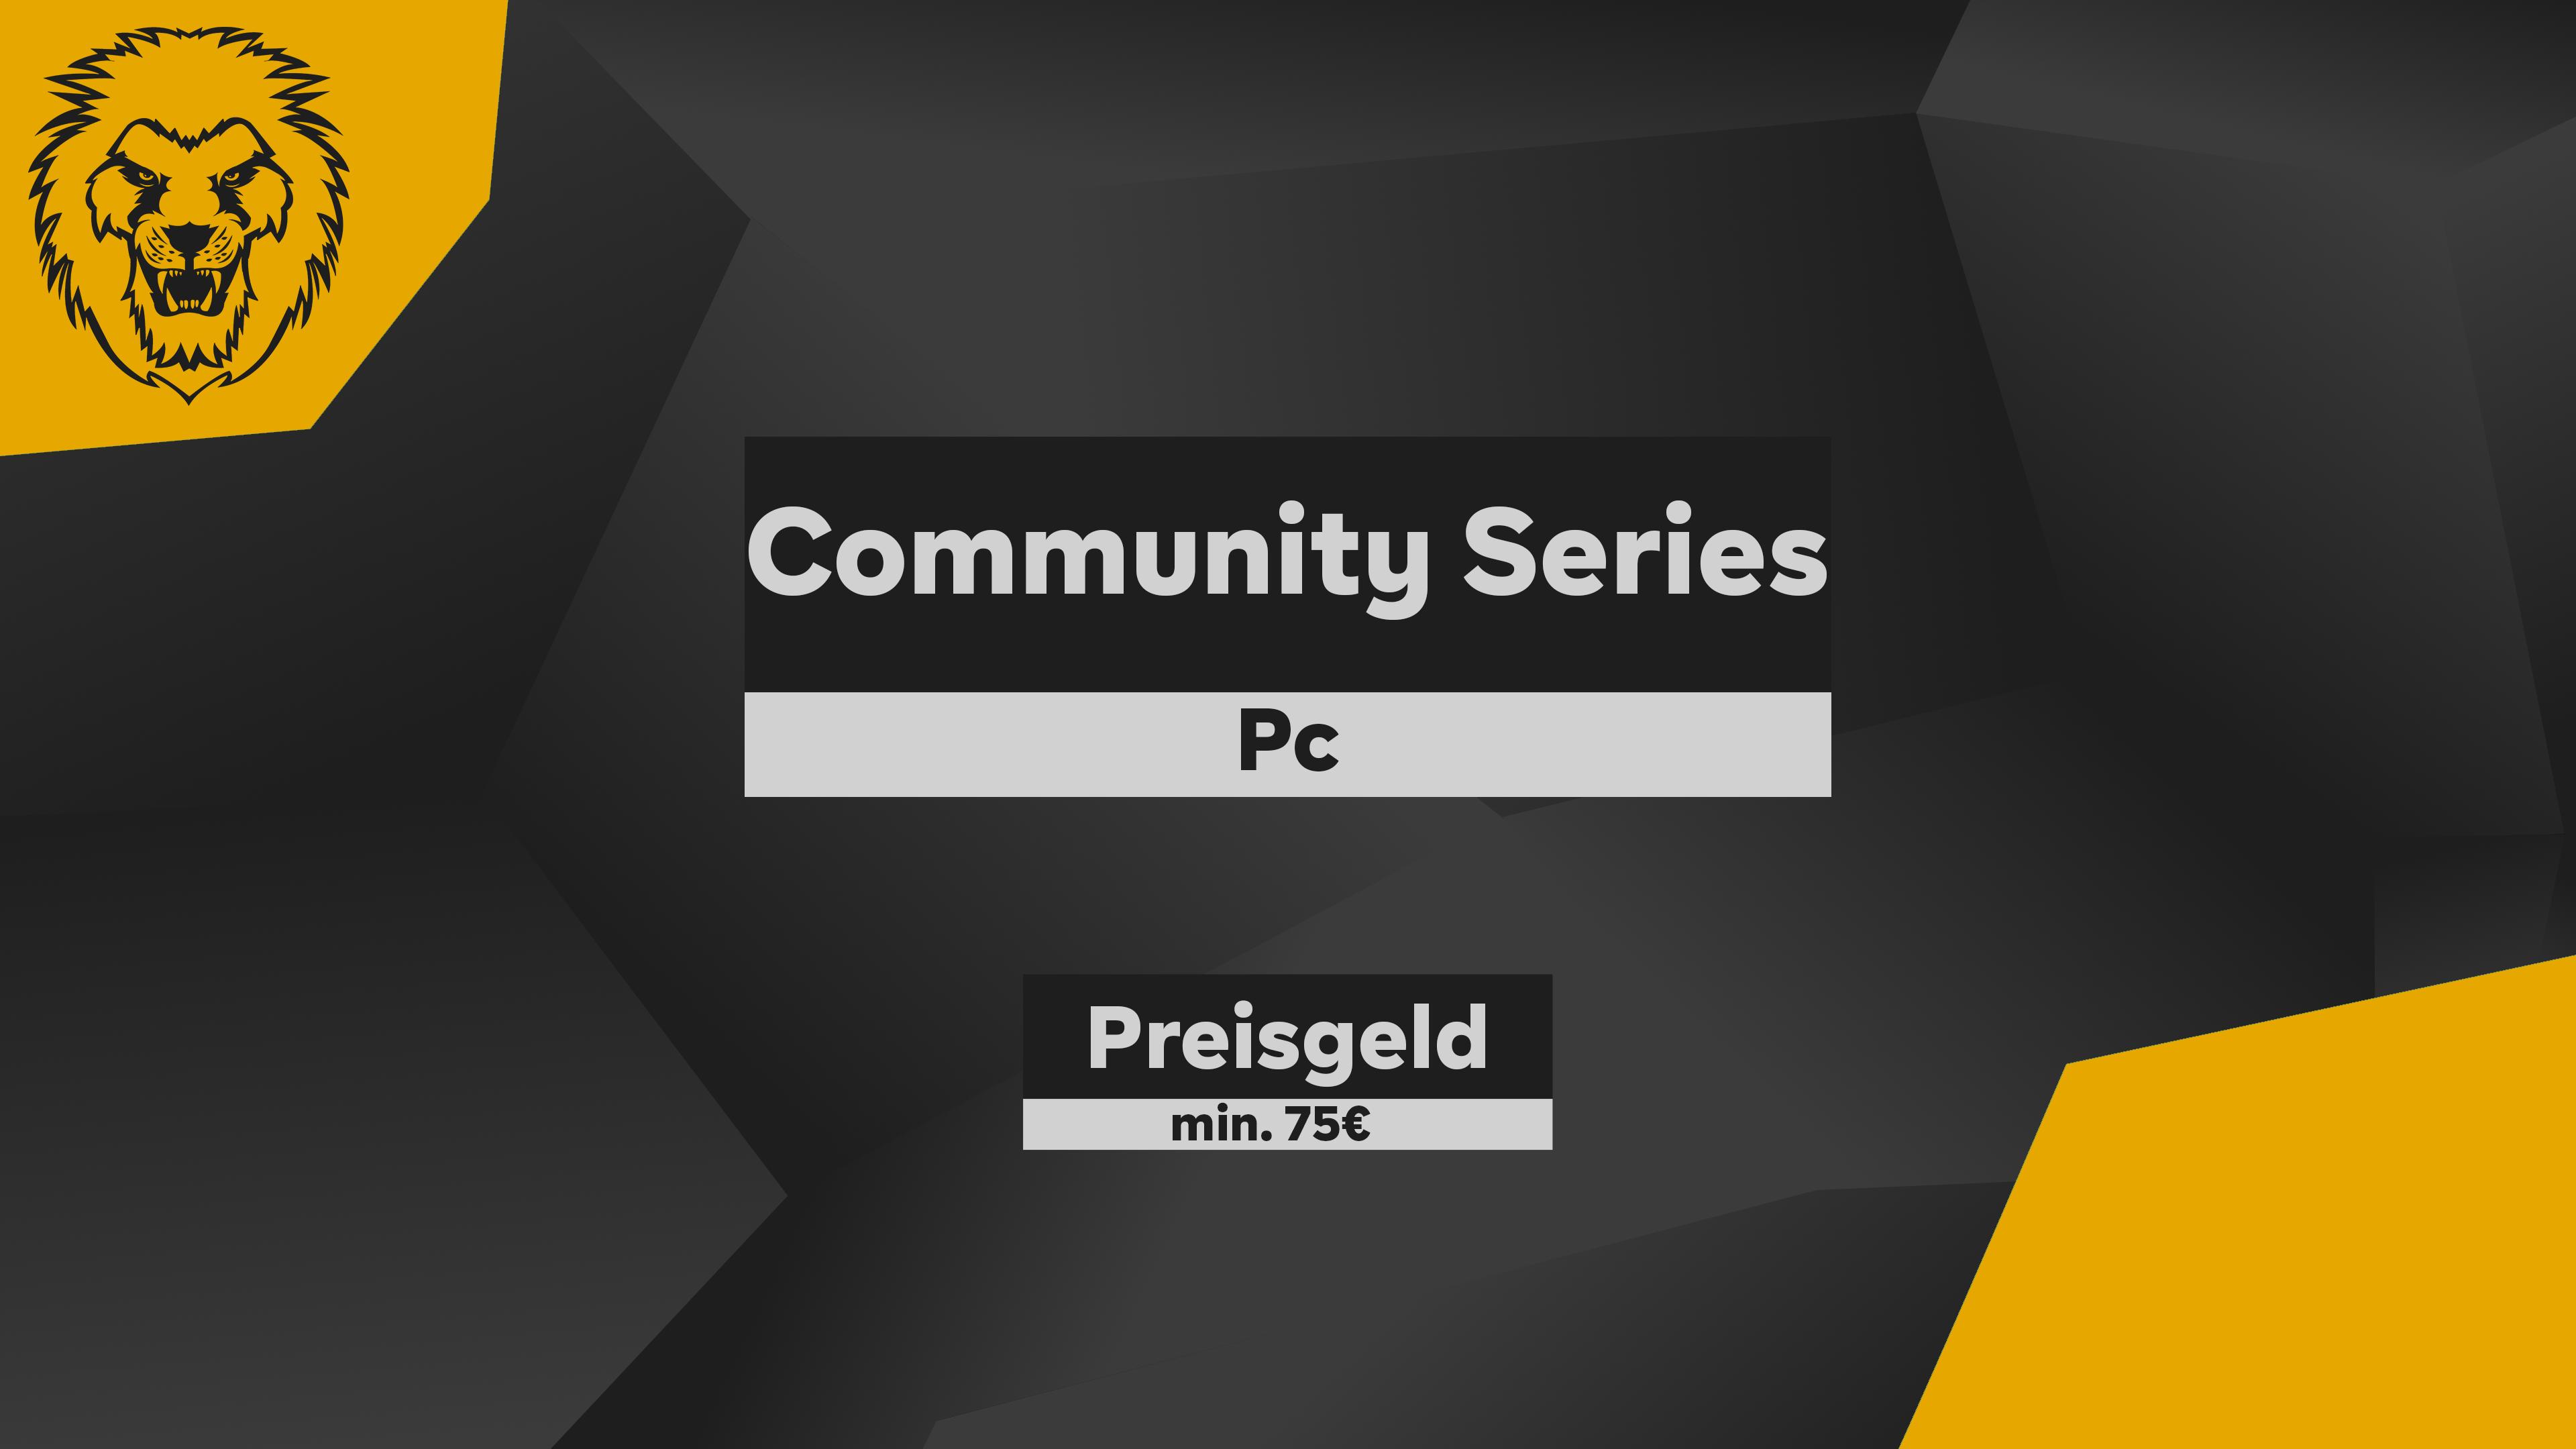 Logo Liga German Community Series #1 Pc YELLOW